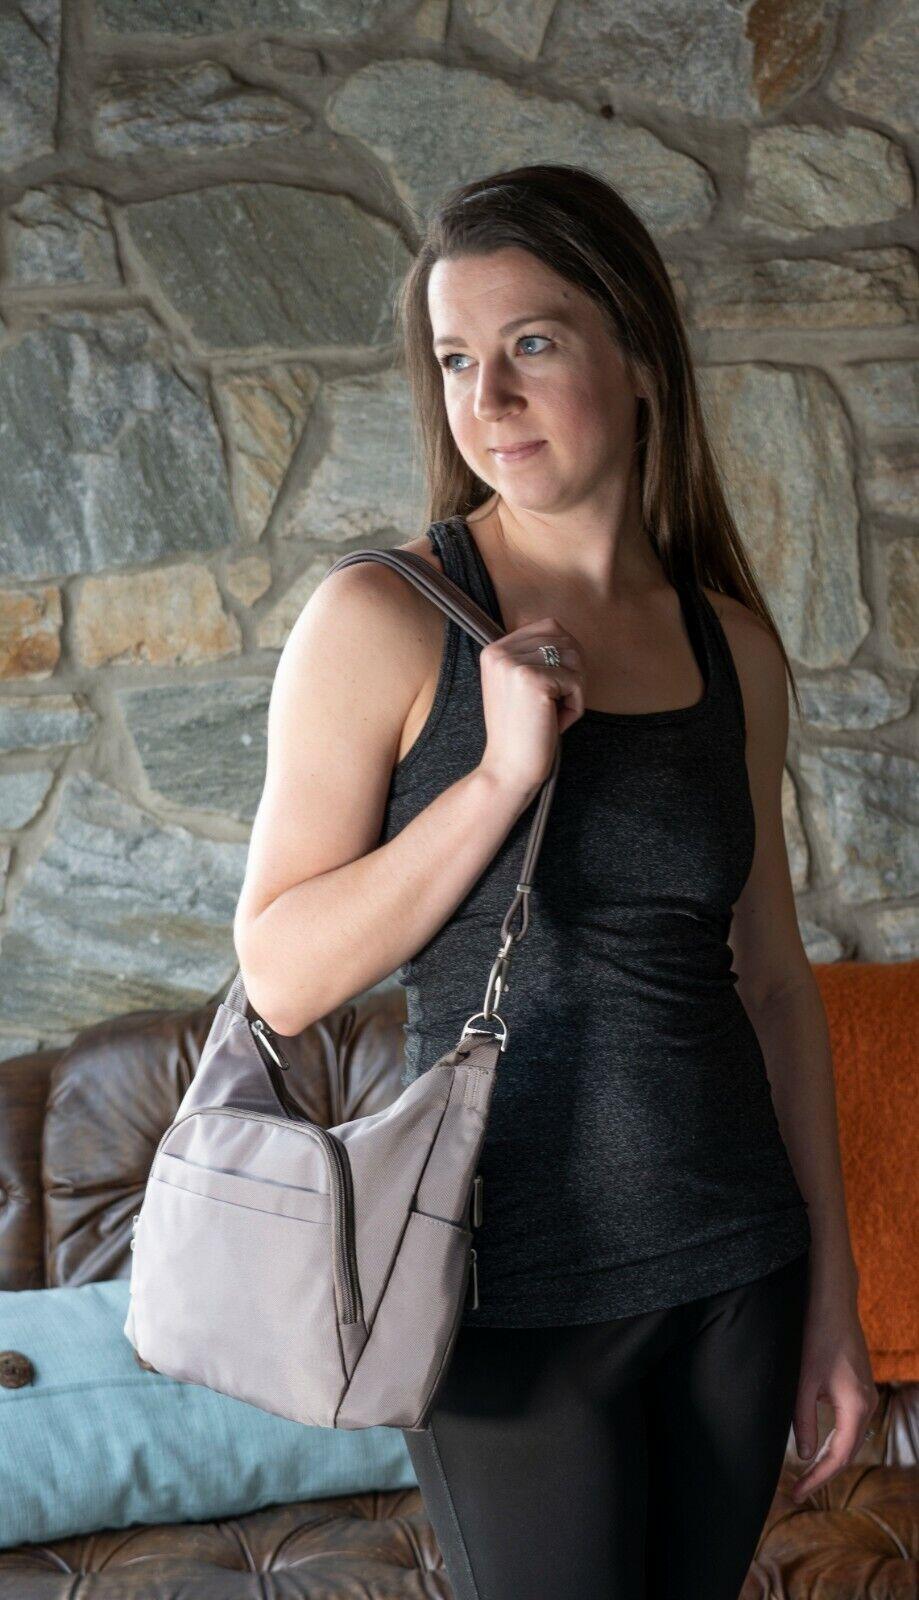 RFID Anti Theft Handbag Cross body Handbag Nutmeg Color Travelon Brand NEW Clothing, Shoes & Accessories